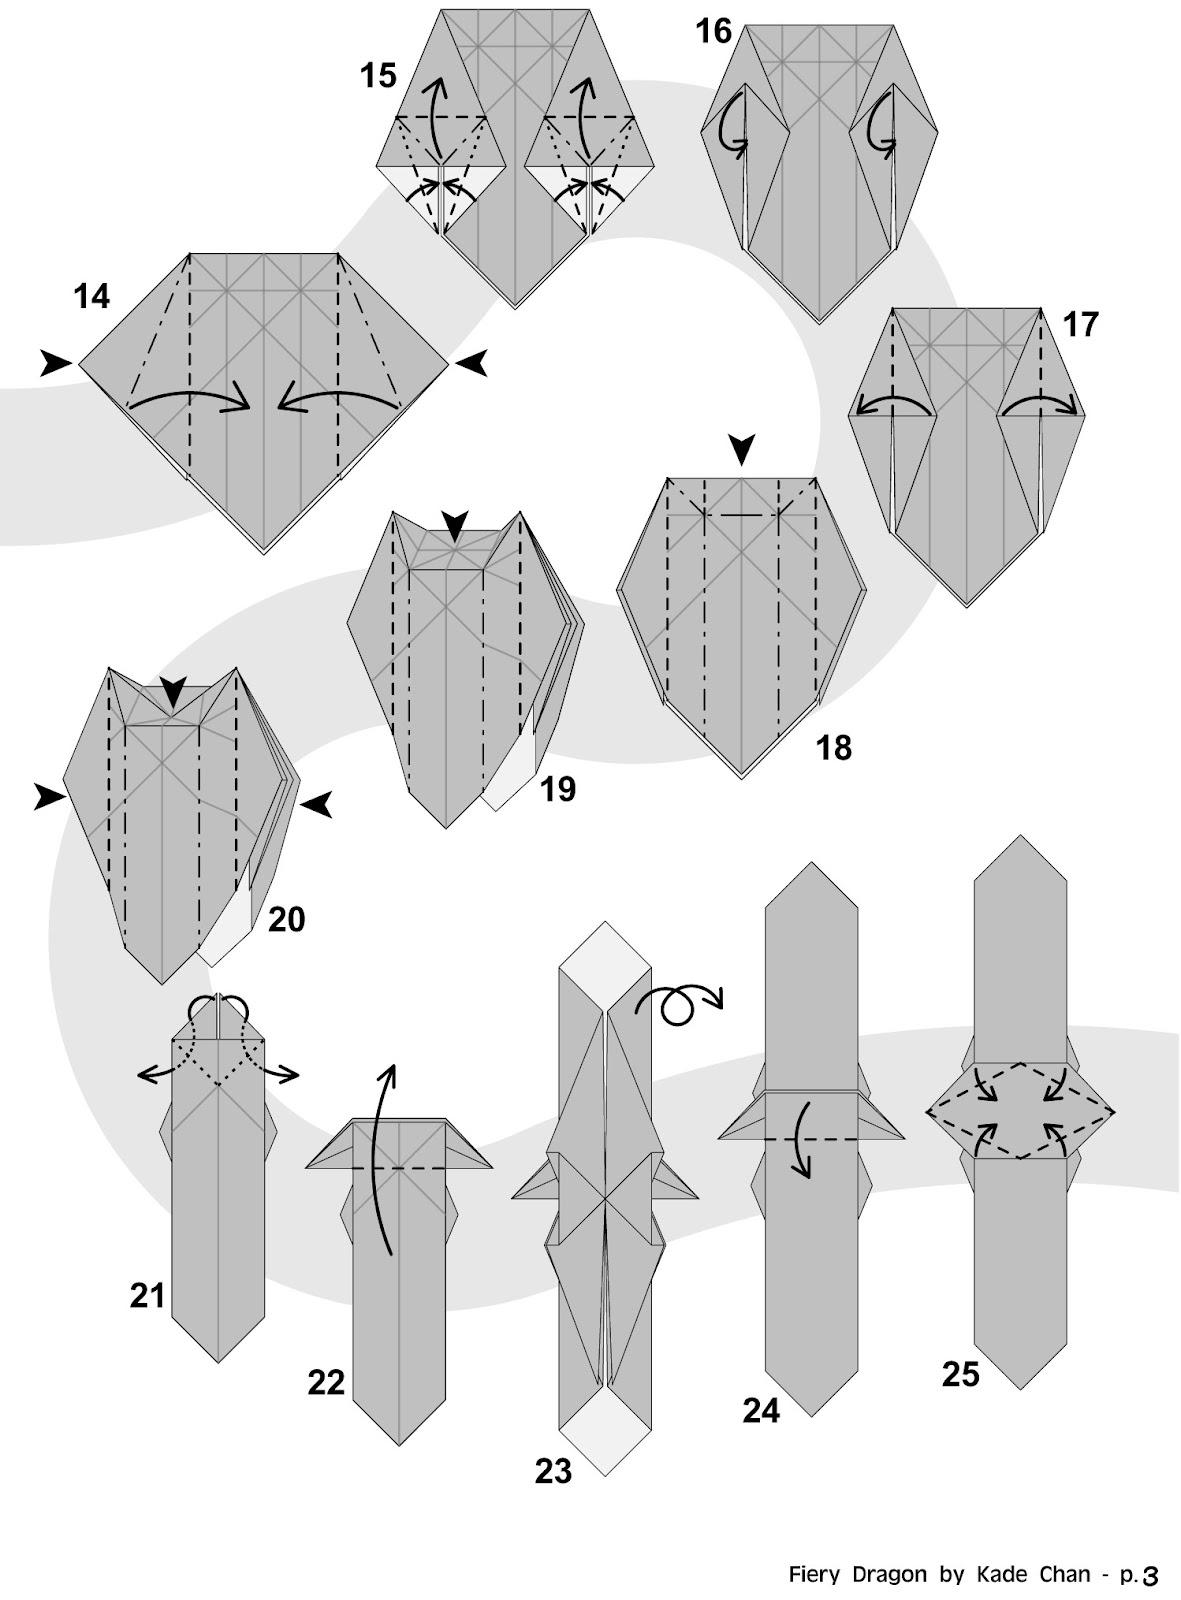 Intermediate Origami Dragon Diagram Volkswagen 2 0 Engine Kade Chan Blog 香港摺紙工作室 日誌 Fiery